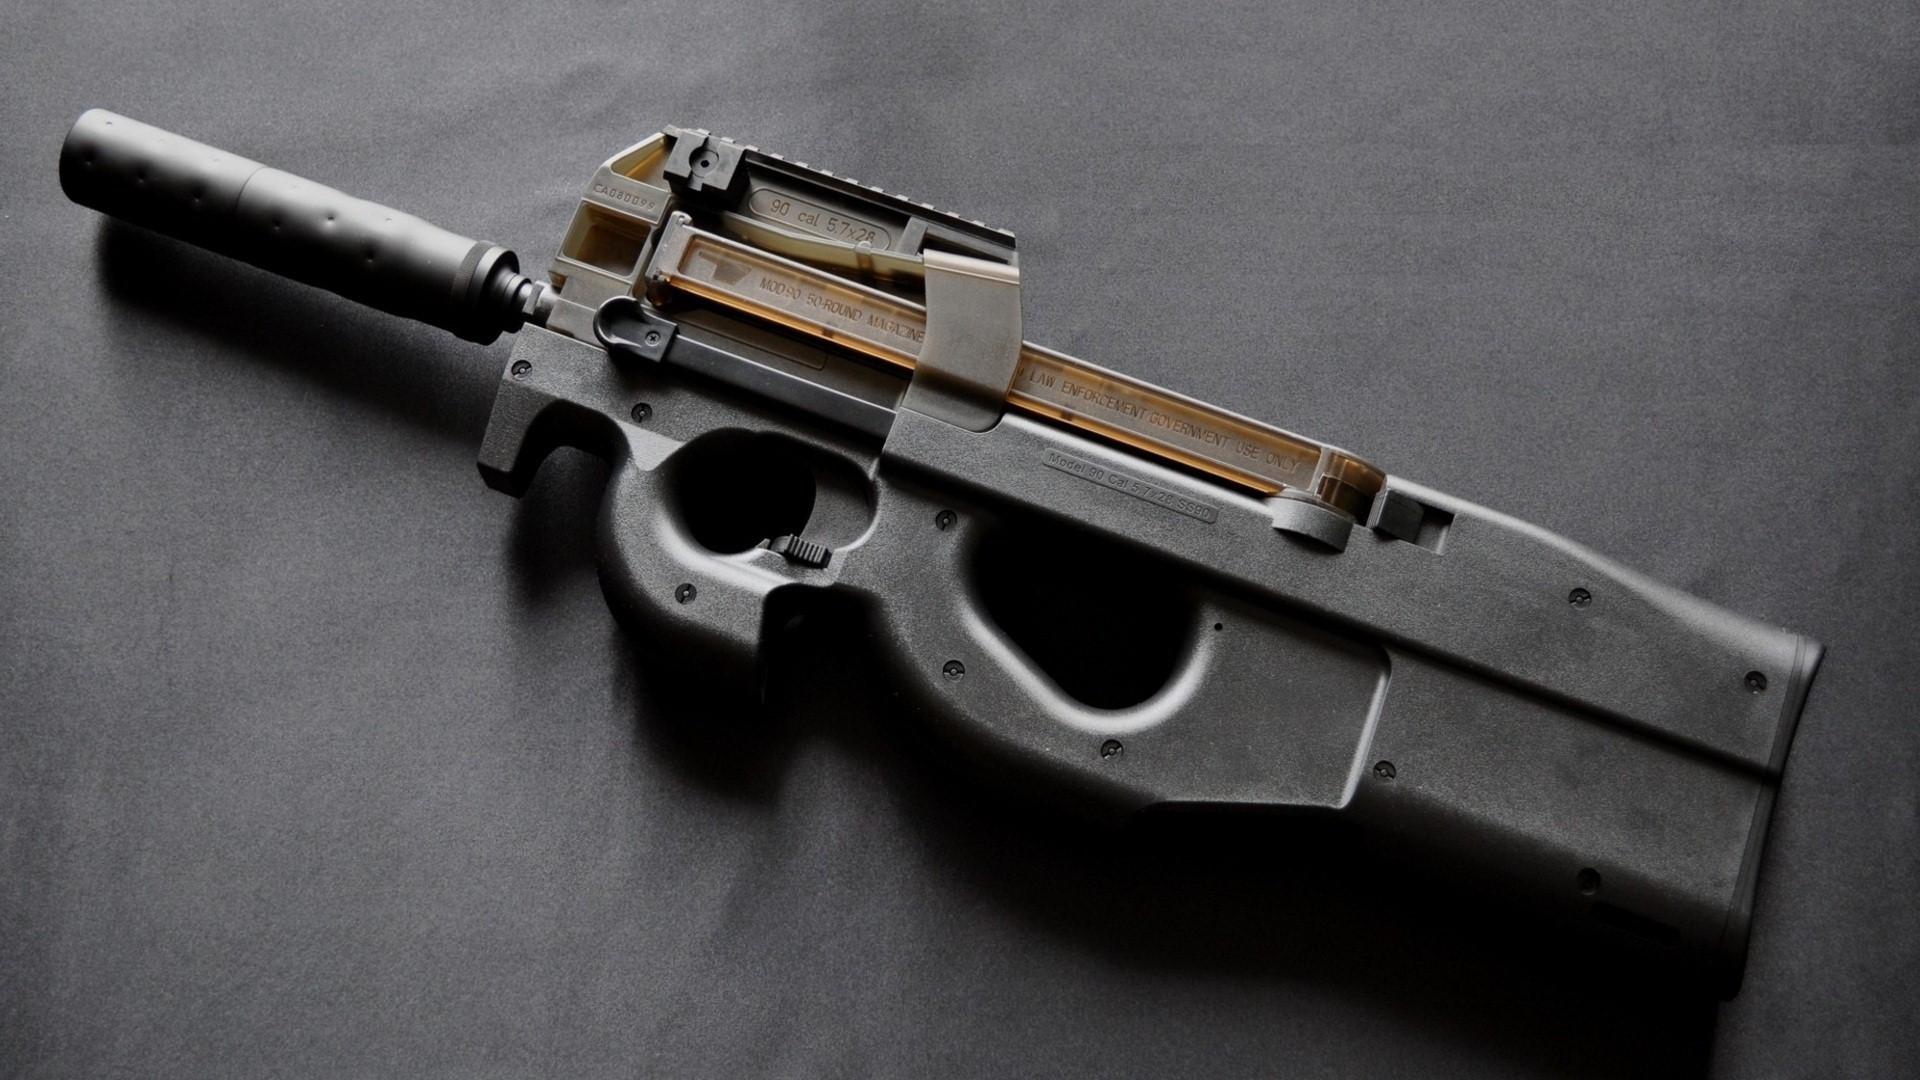 Cool Gun Wallpapers HD 1920x1080